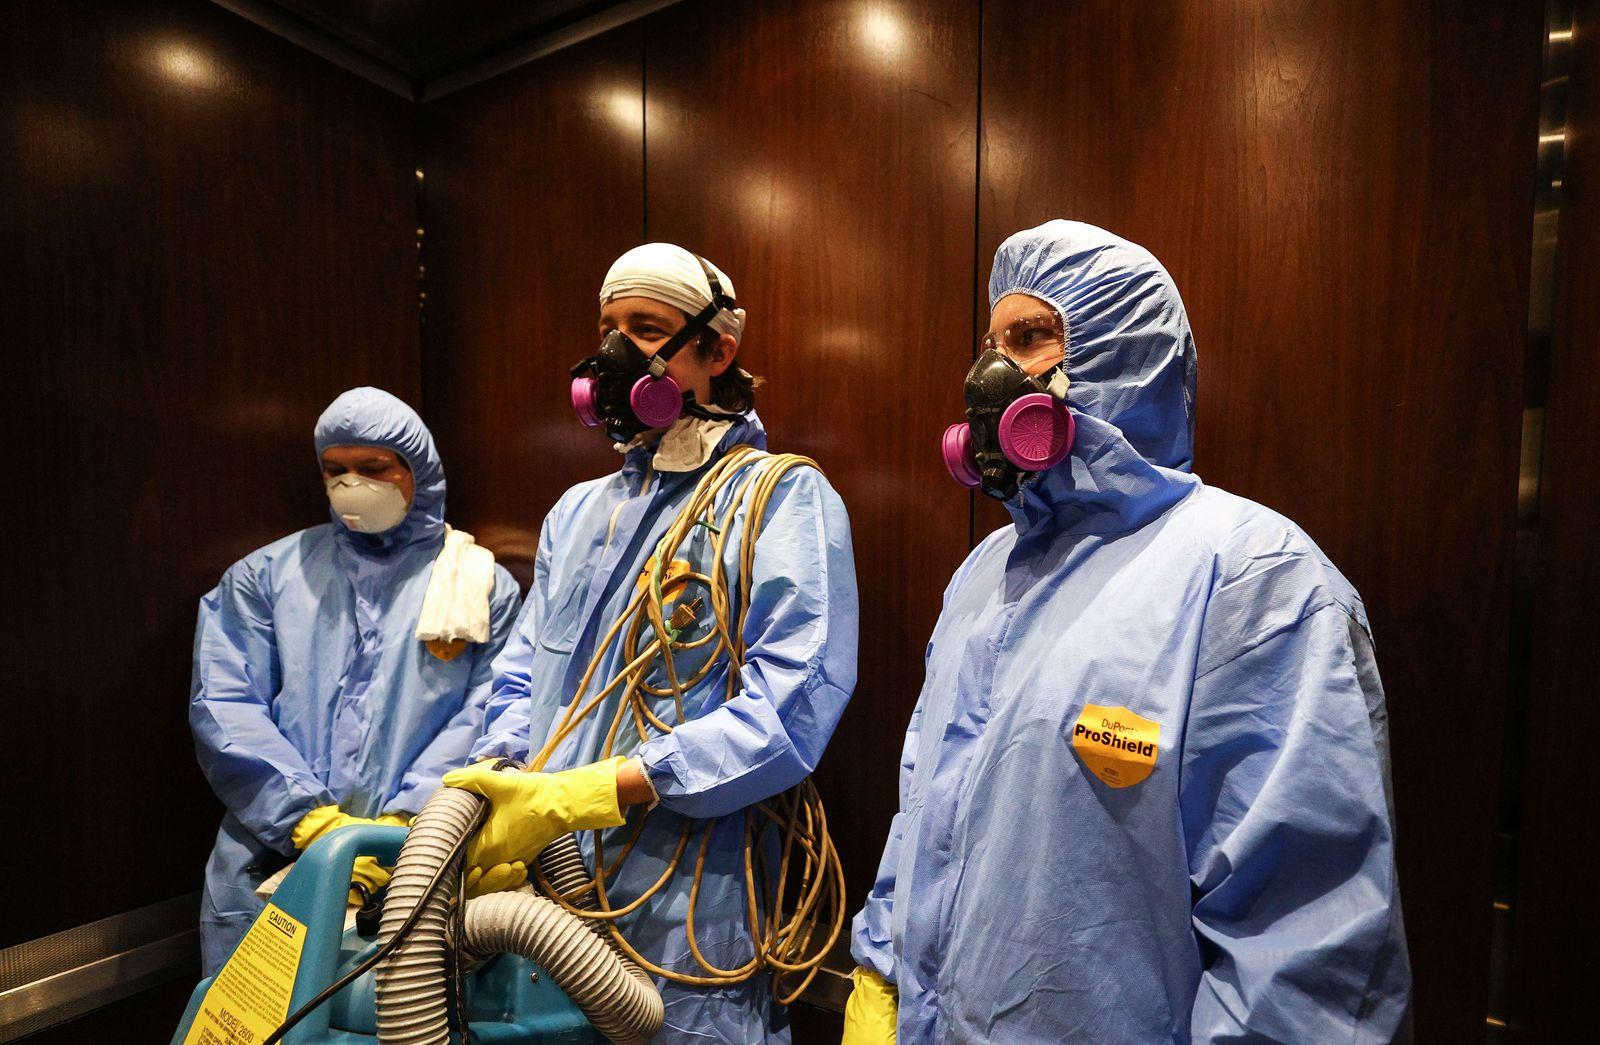 U.S. Businesses Disinfect Properties To Stem Spread Of Coronavirus